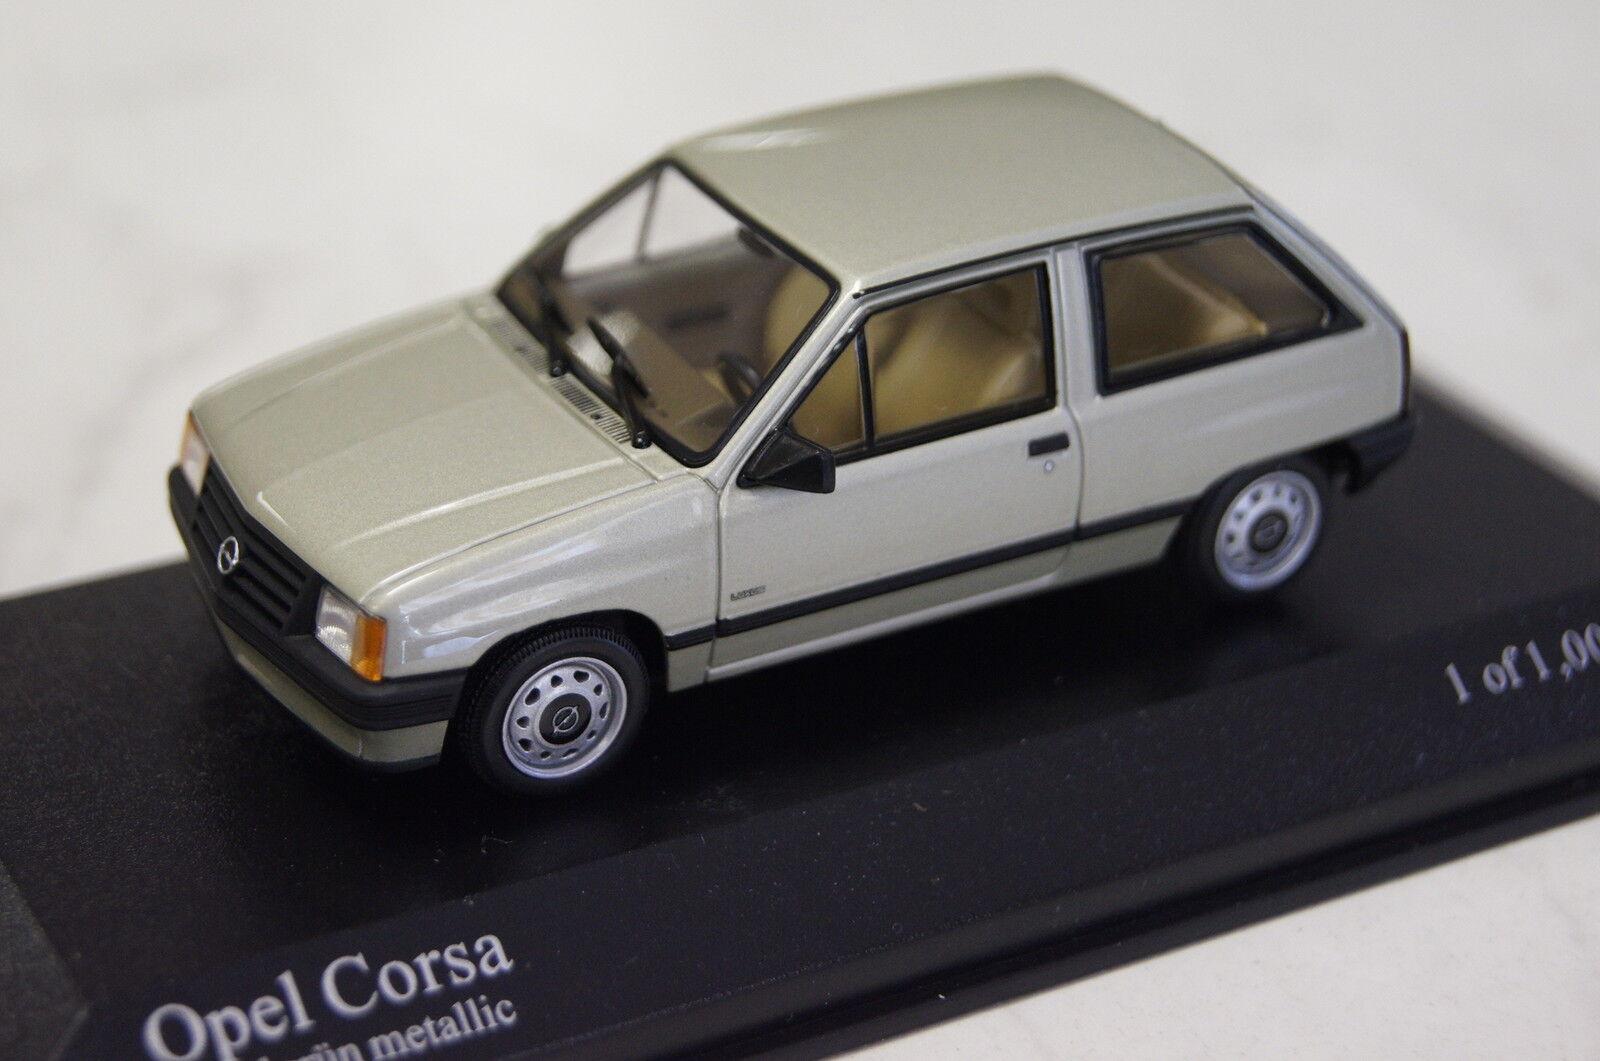 Opel corsa ein 1983 hellgr ü n metallic 1 43 minichamps neu & ovp 400045002